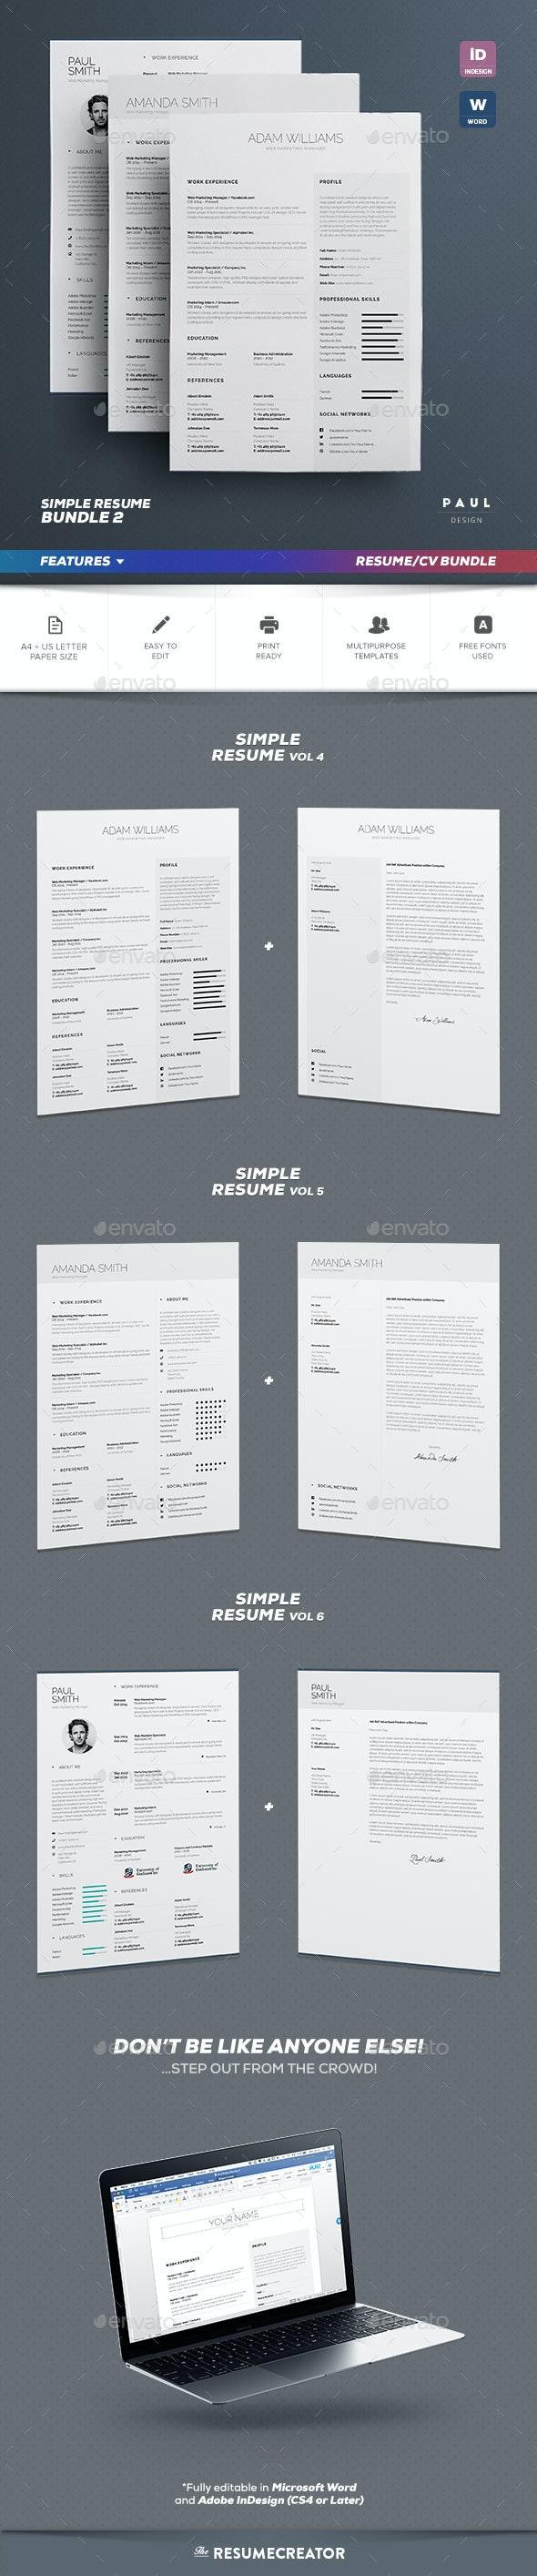 Simple Resume/Cv Bundle Volume 2 - Resumes Stationery